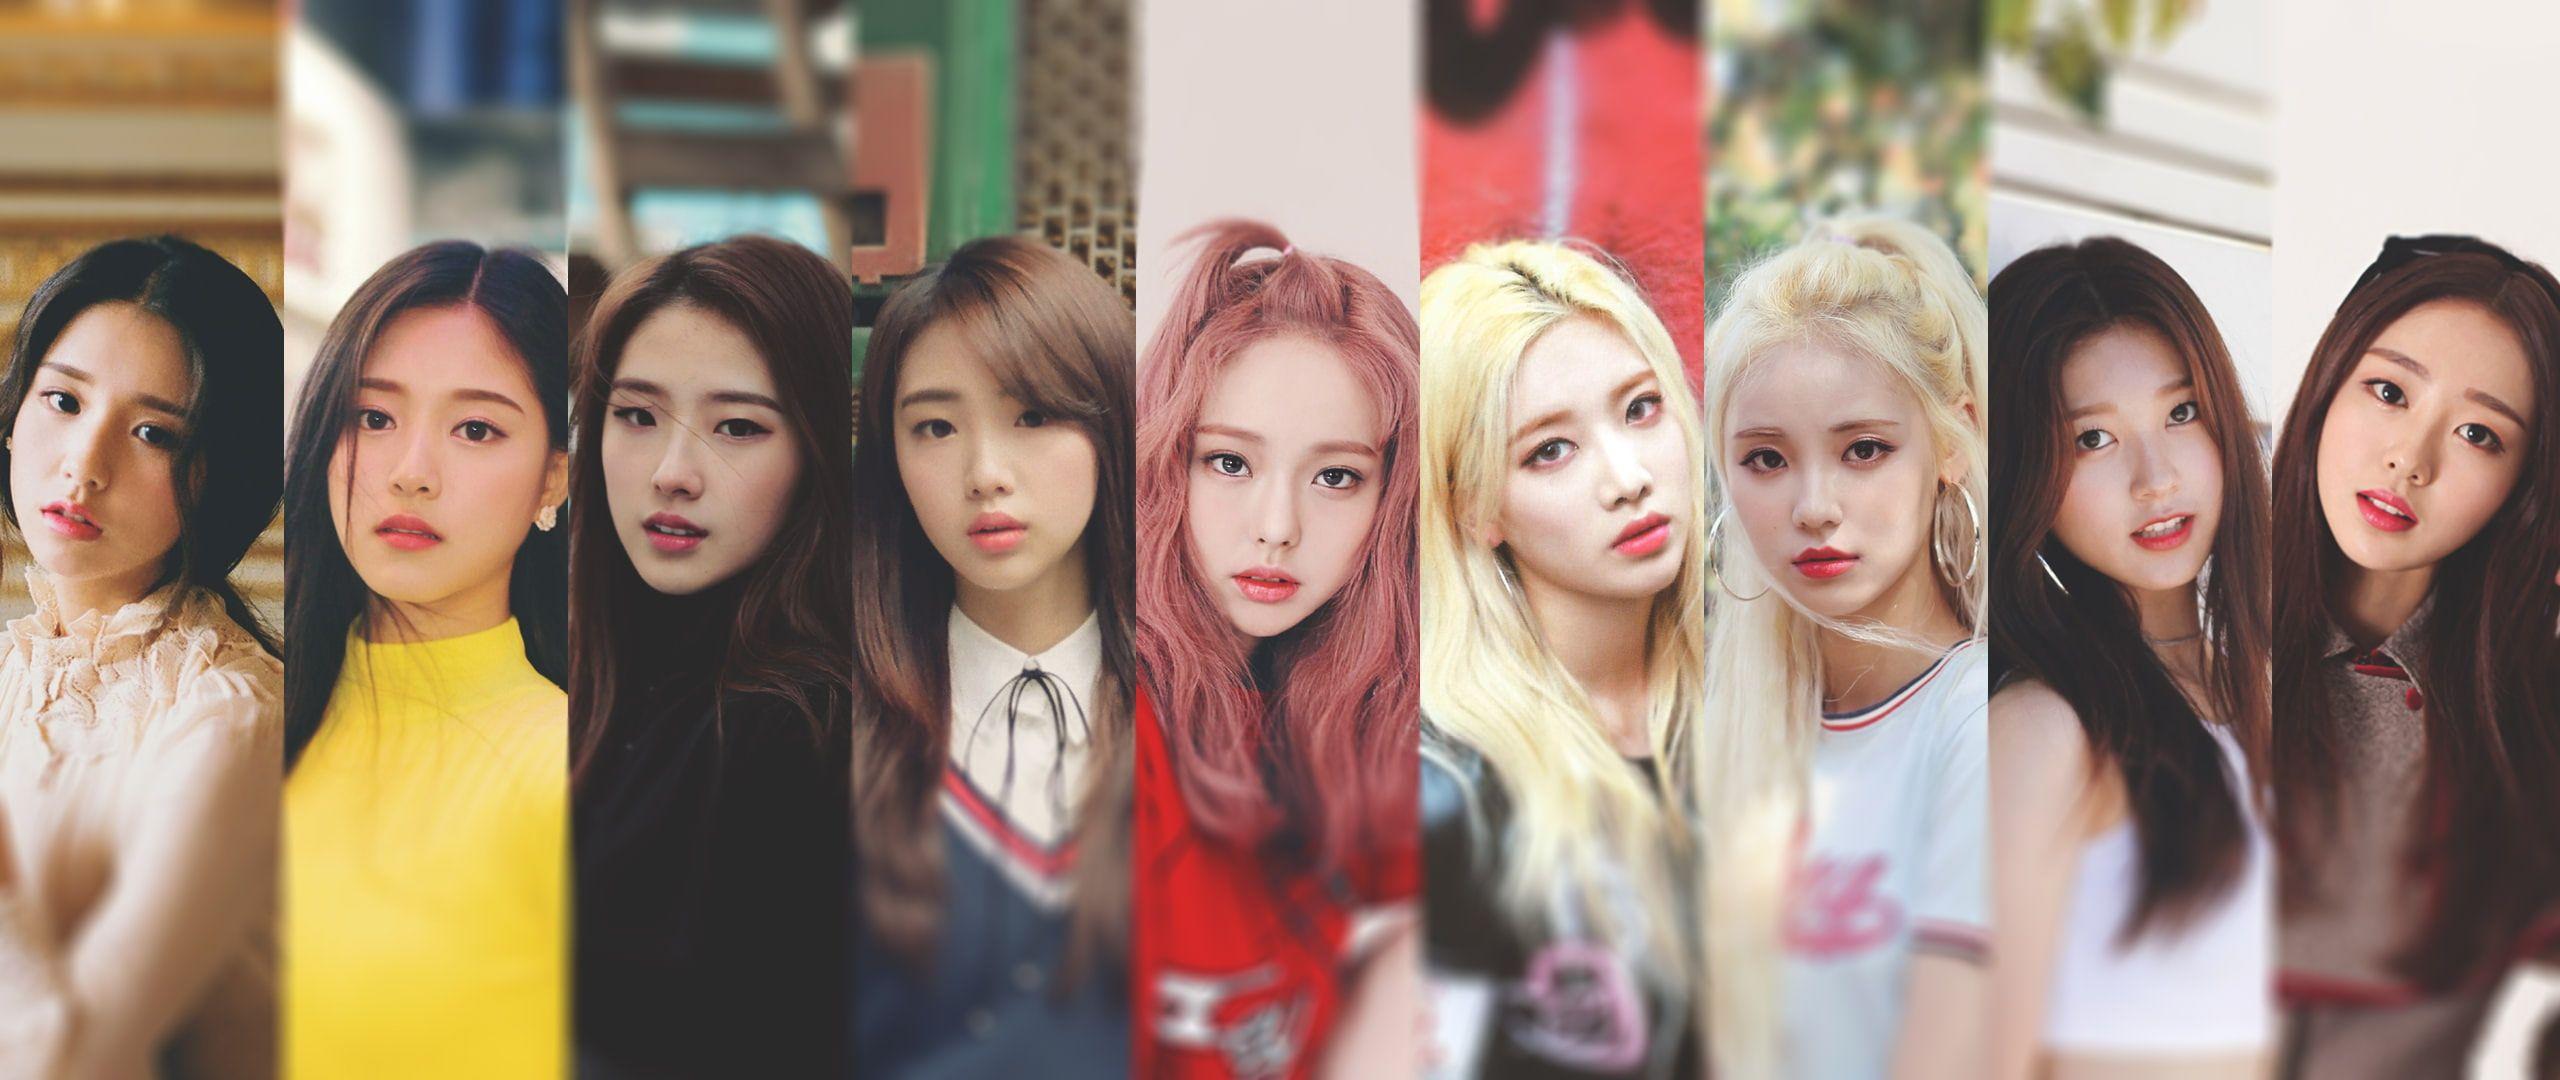 K Pop Loona Women Heejin Hyunjin Haseul Yeojin Kim Lip Jinsoul Choerry Yves Vivi 2k Wallpaper Hdwallpaper De Sulli Kpop Girls Korean Girl Groups